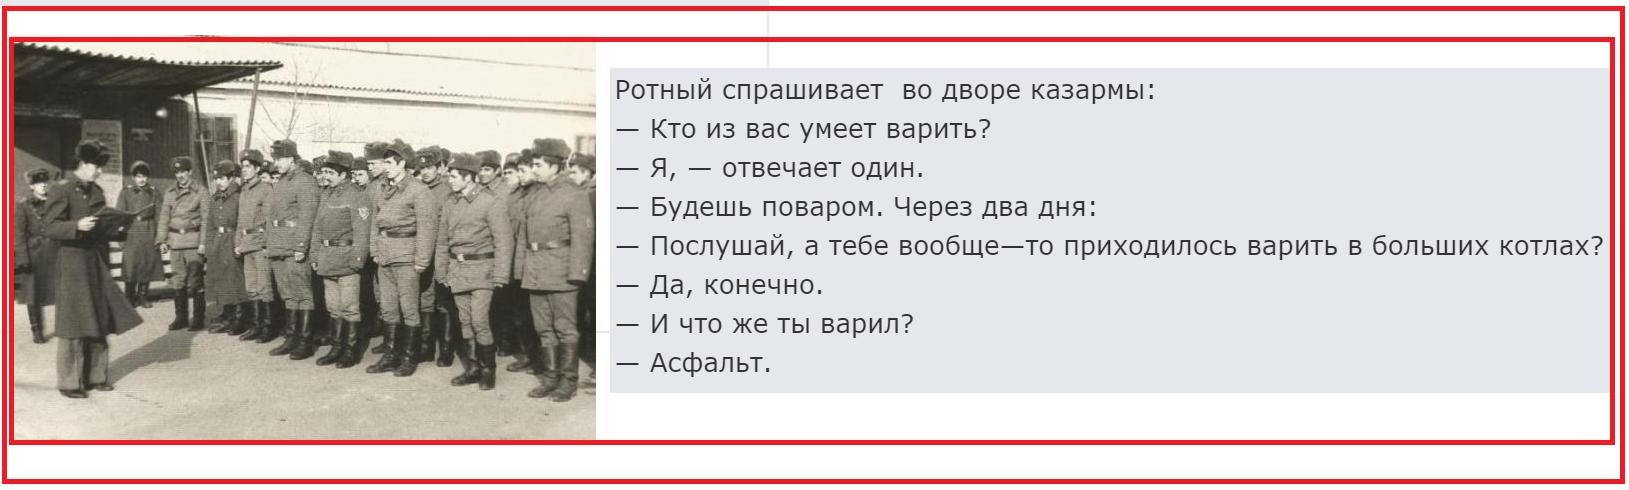 http://sa.uploads.ru/ujYAJ.png